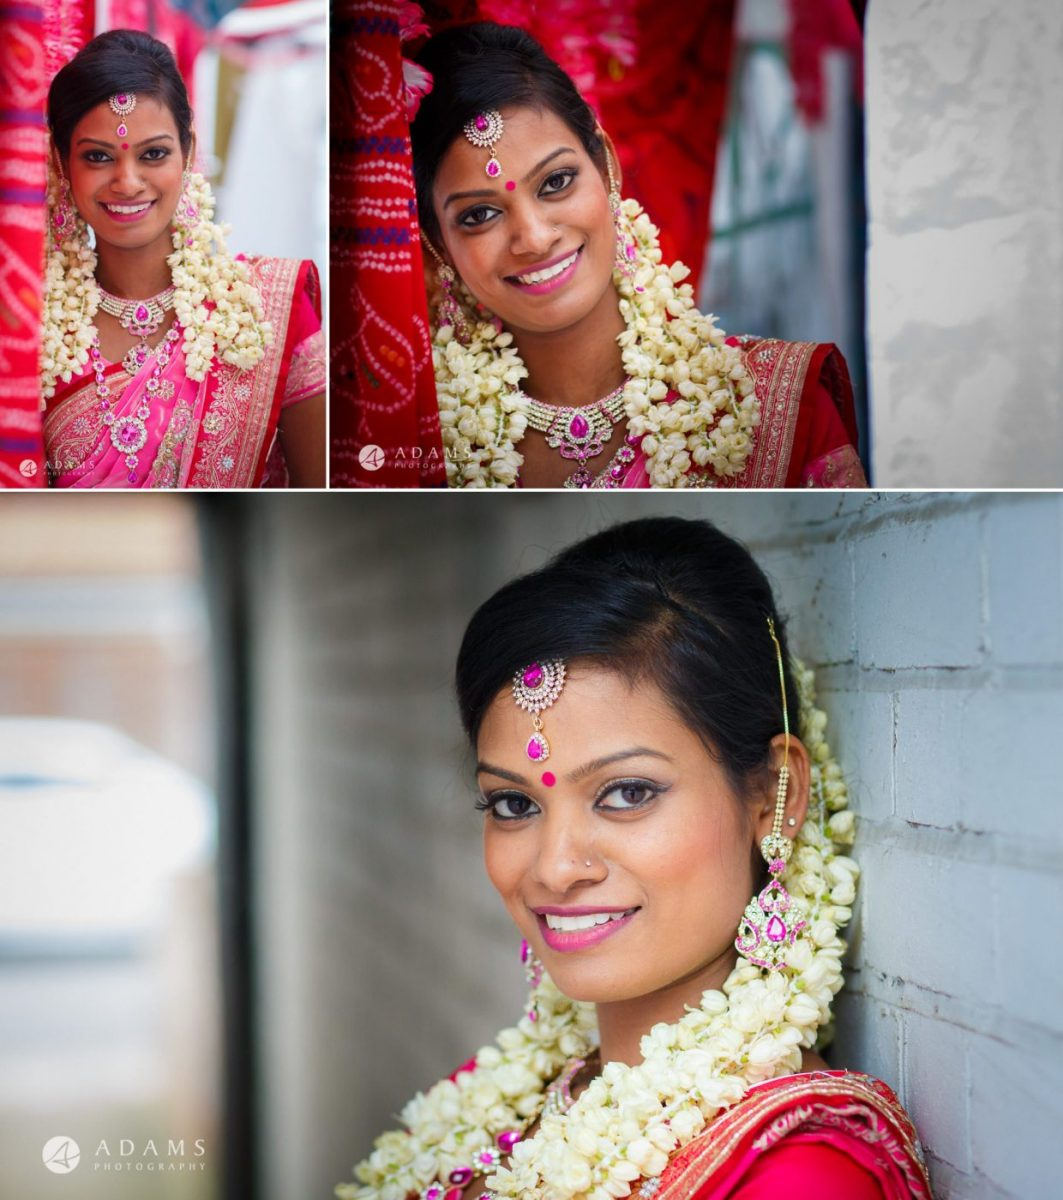 london photography - the tamil wedding